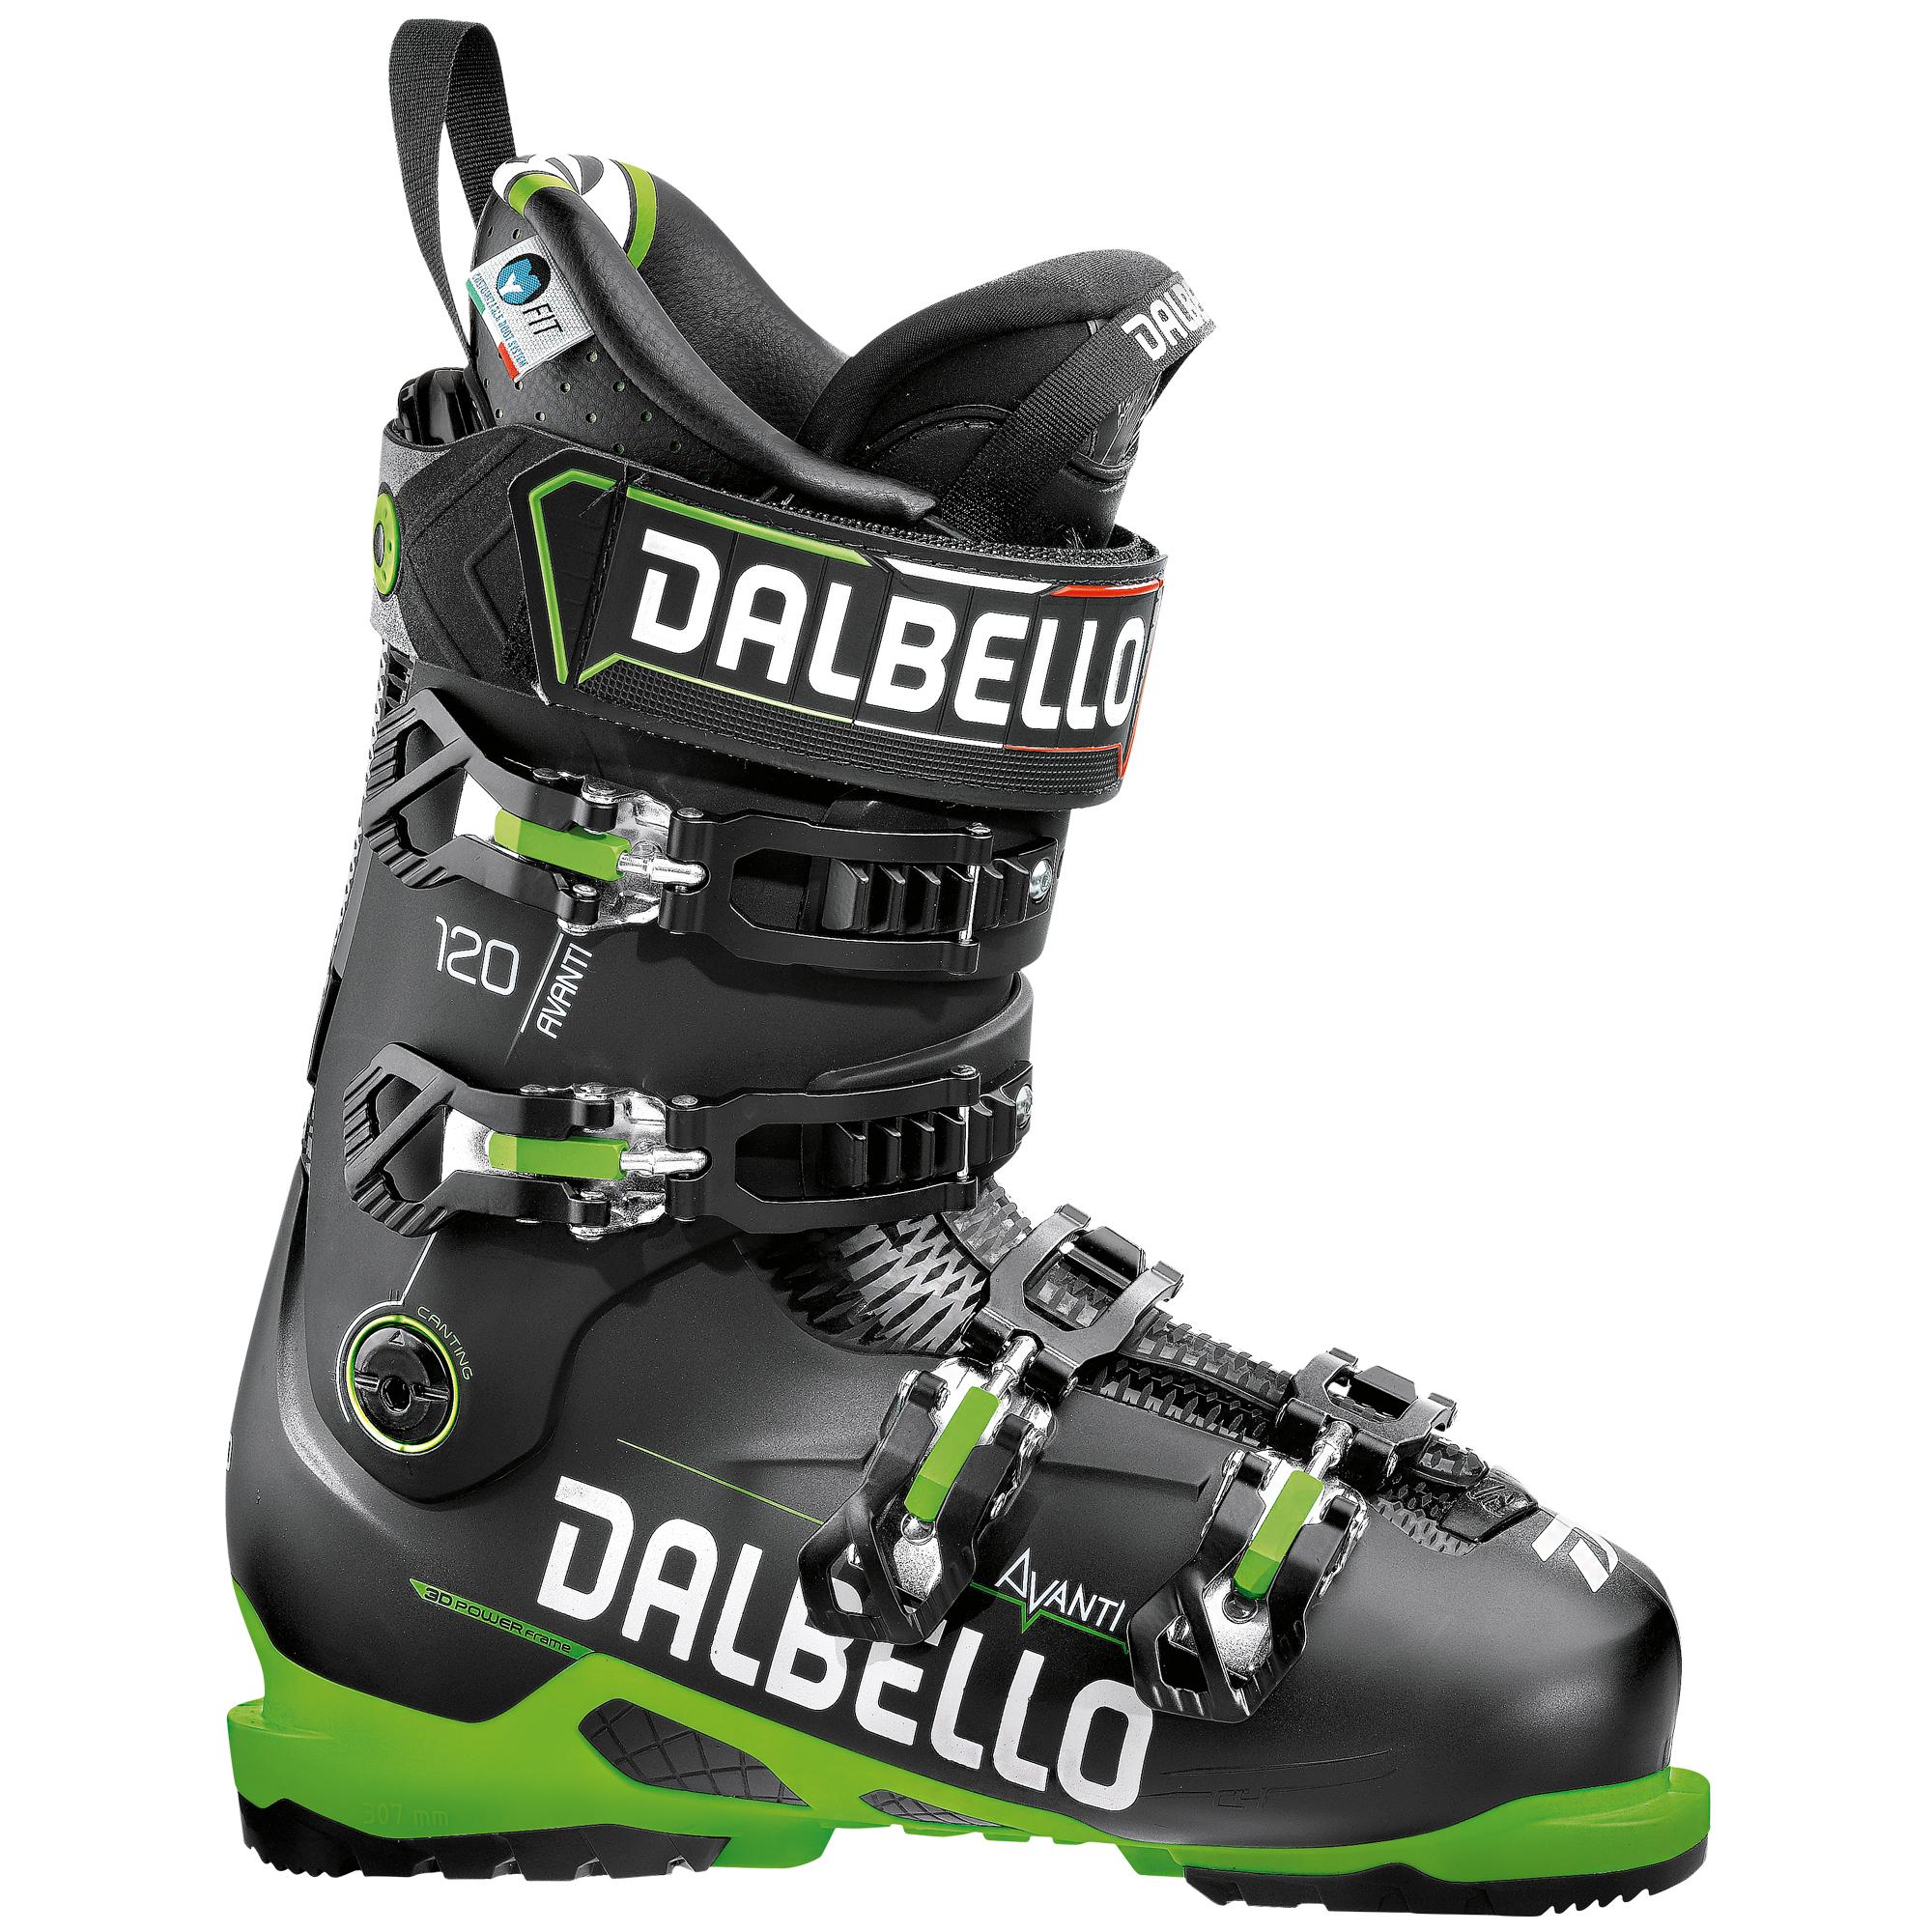 Dalbello Avanti 120 Ski Boots